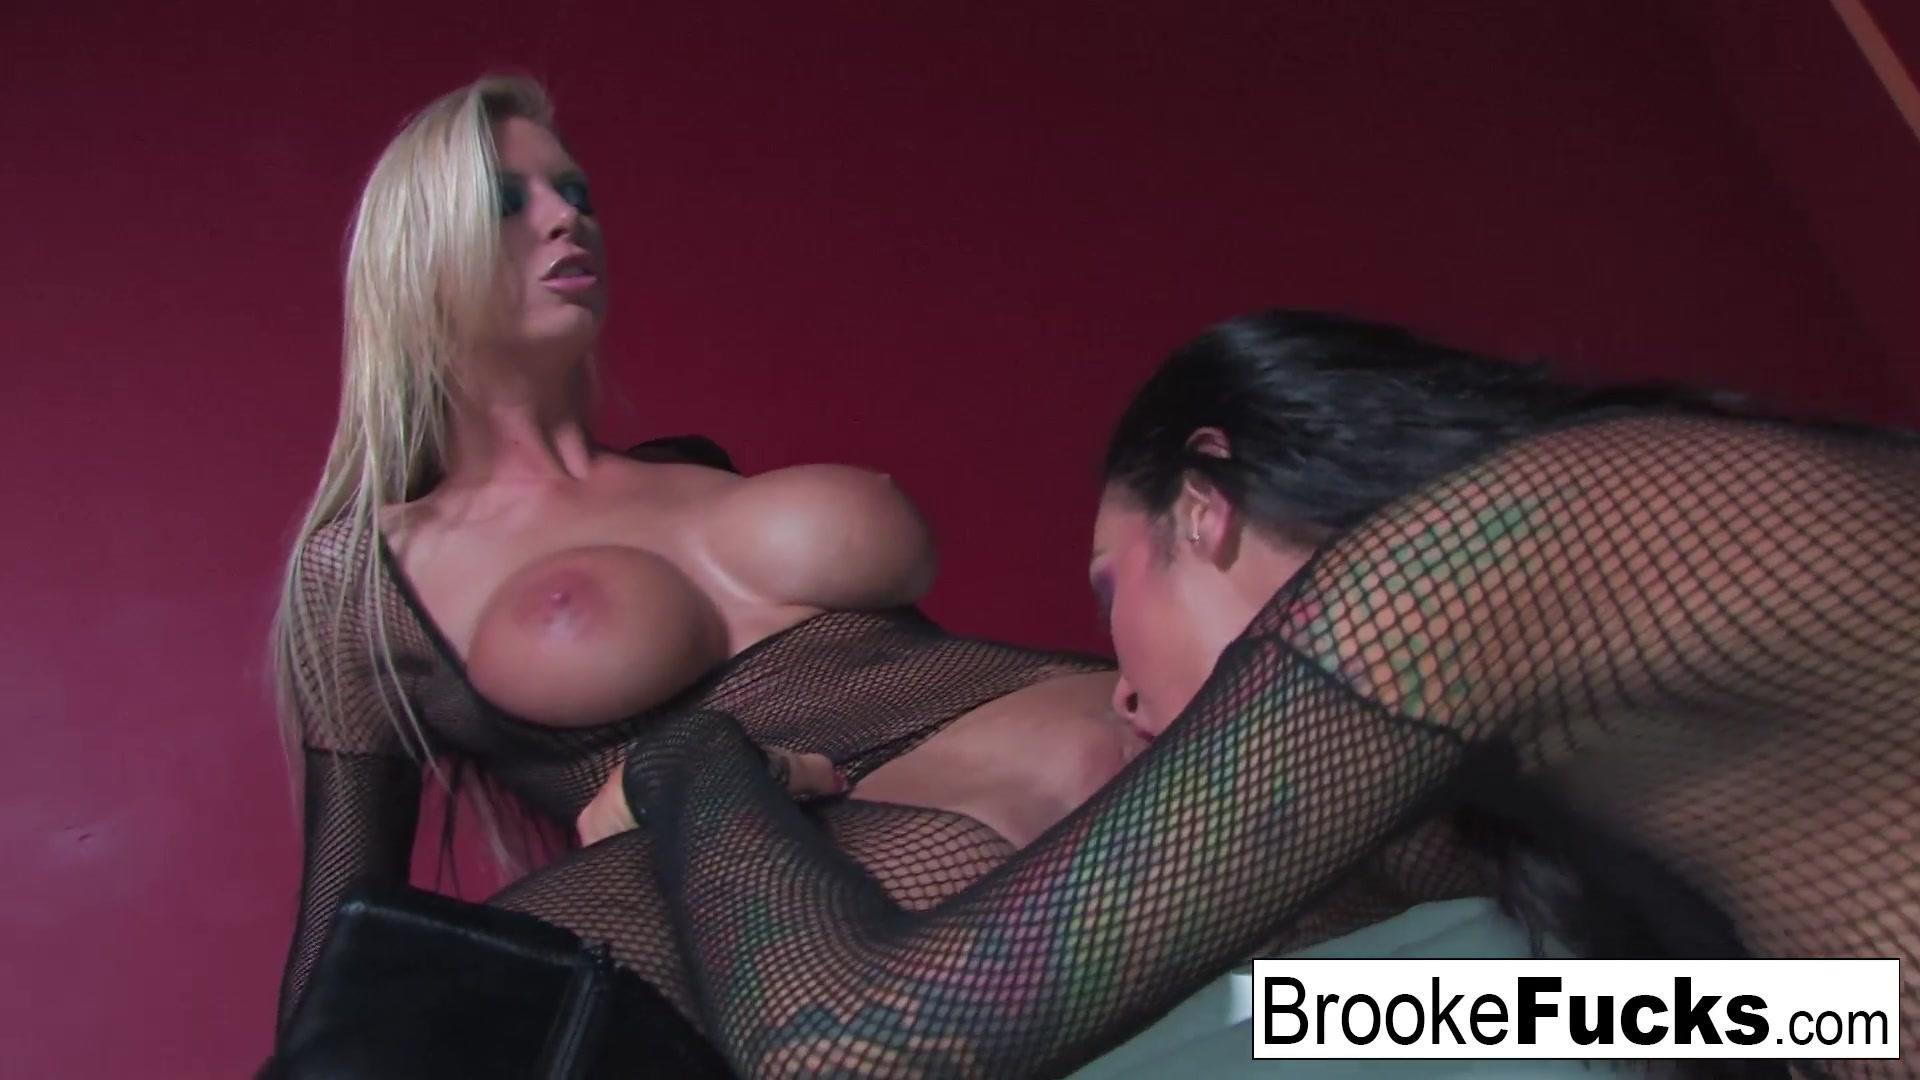 Lesbiam sexo orgasm Boobes